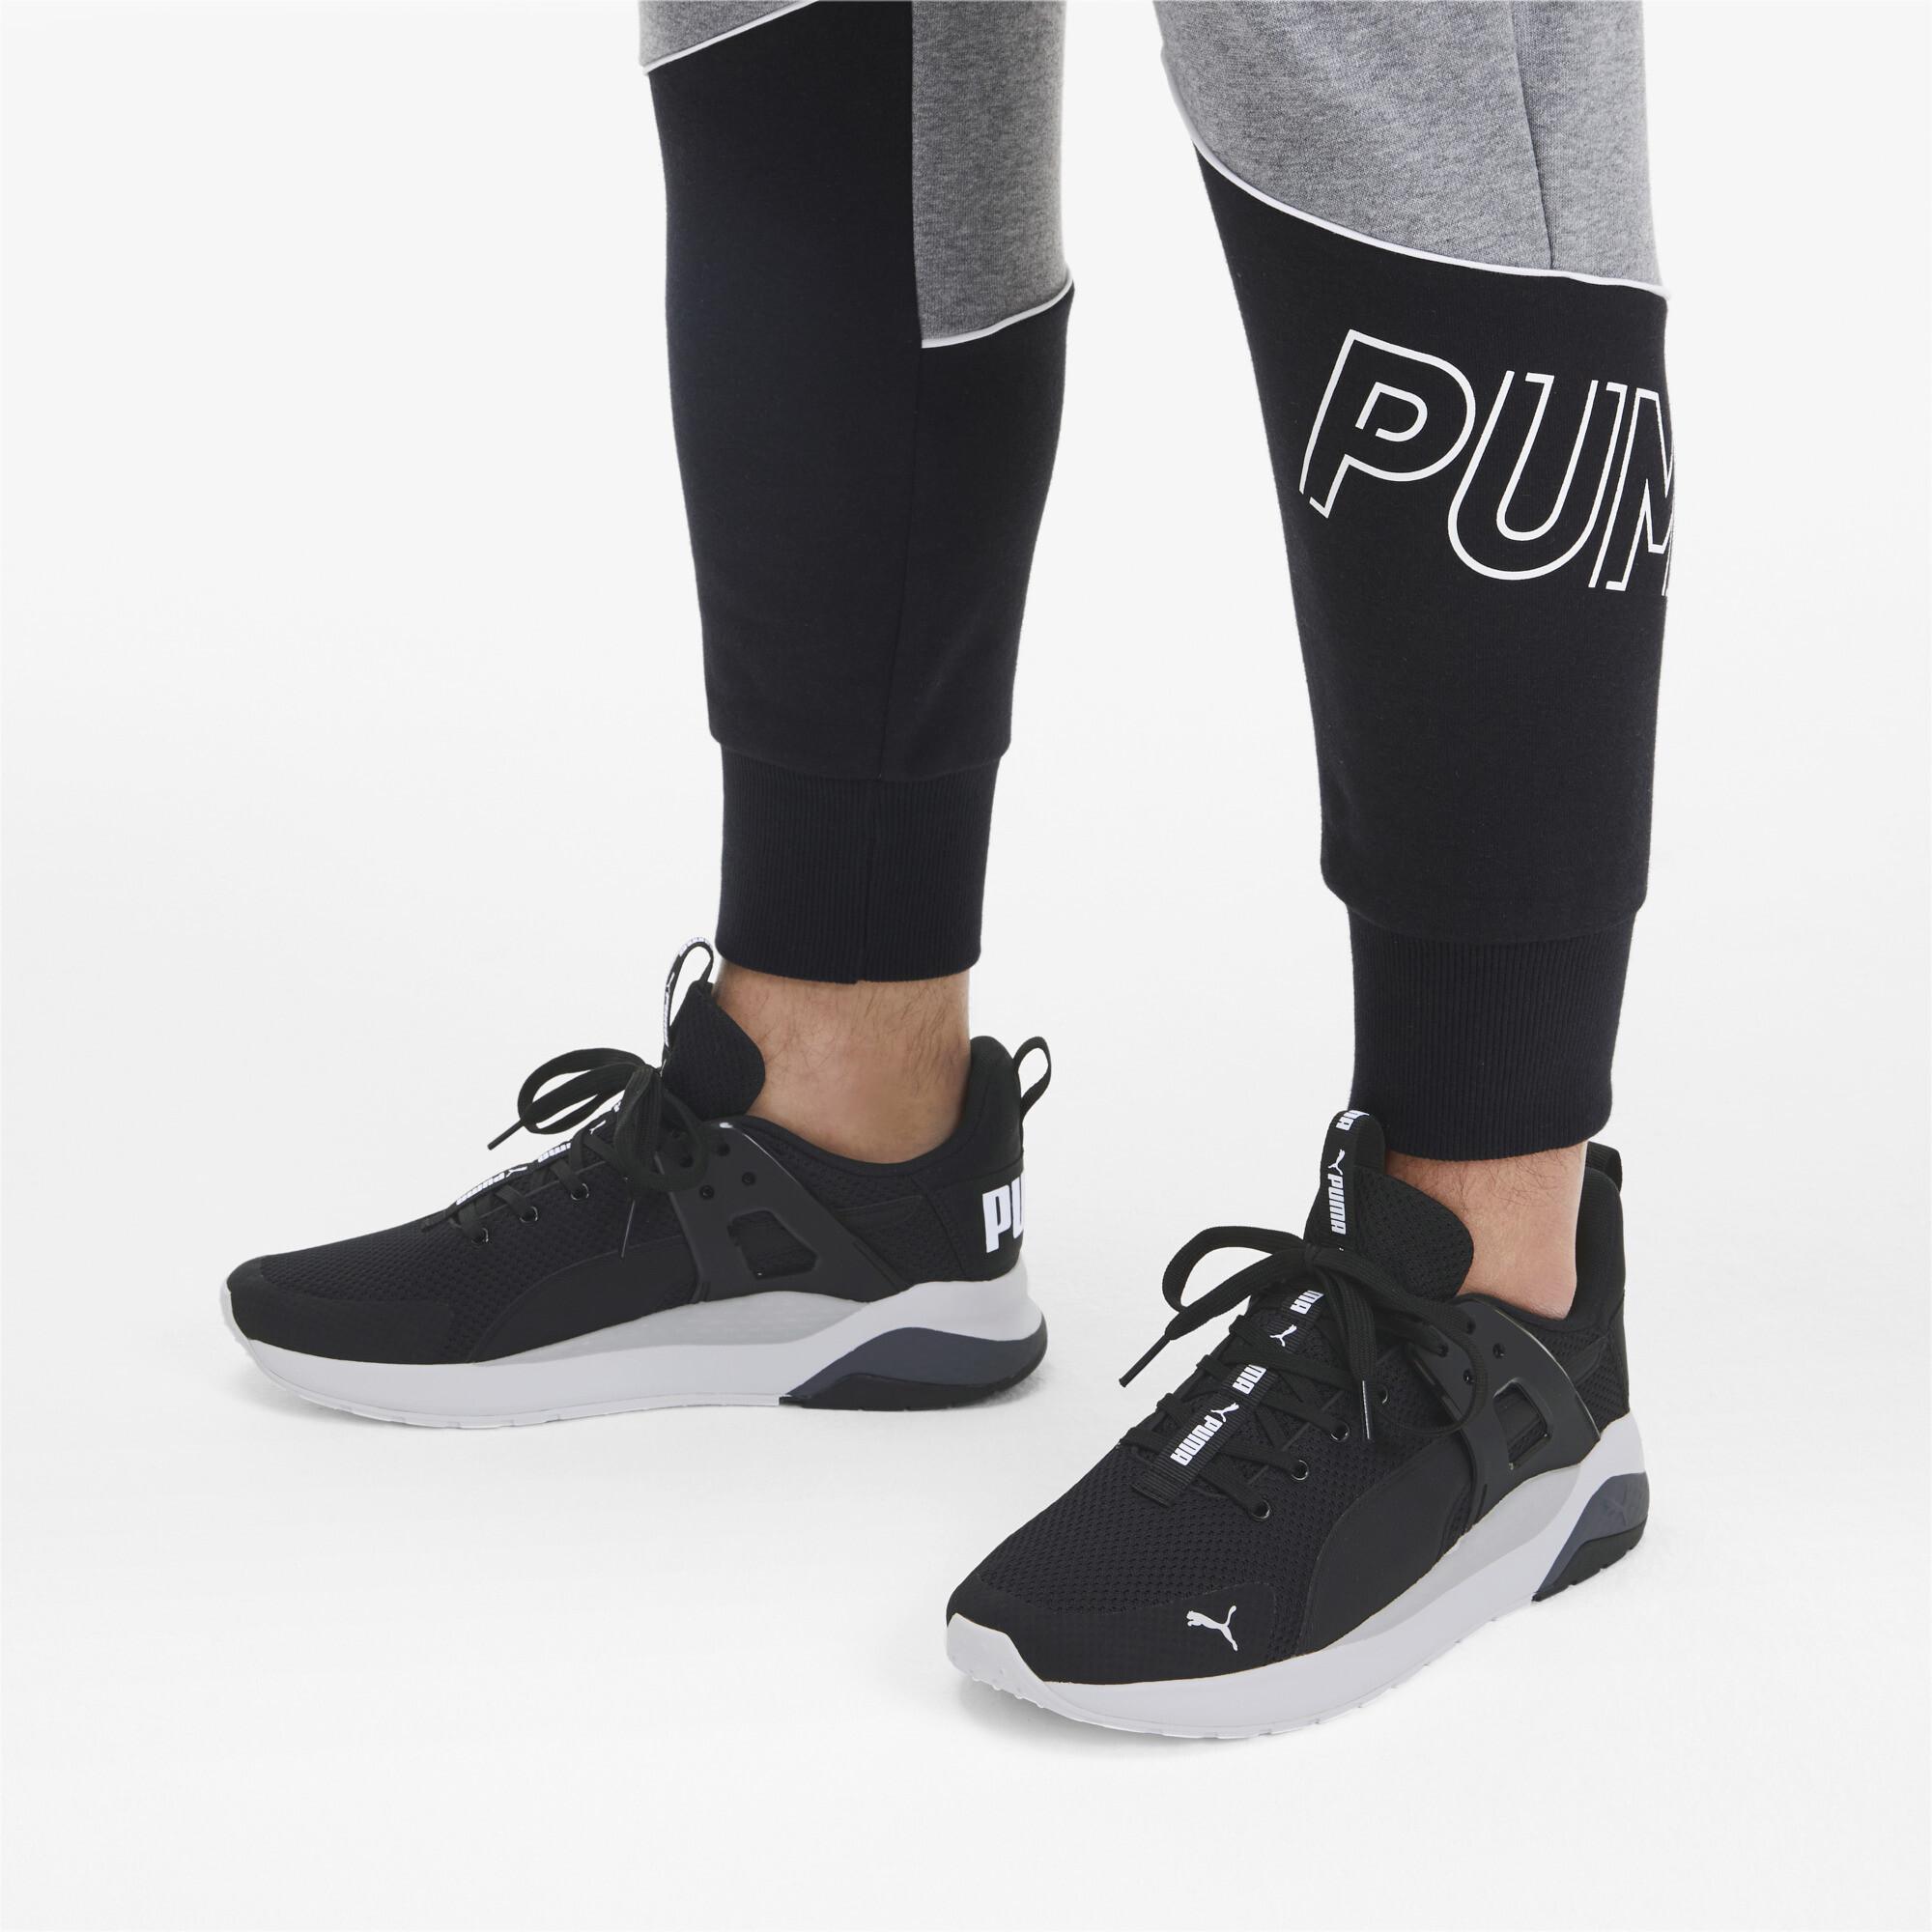 thumbnail 11 - PUMA-Men-039-s-Anzarun-Cage-Sneakers